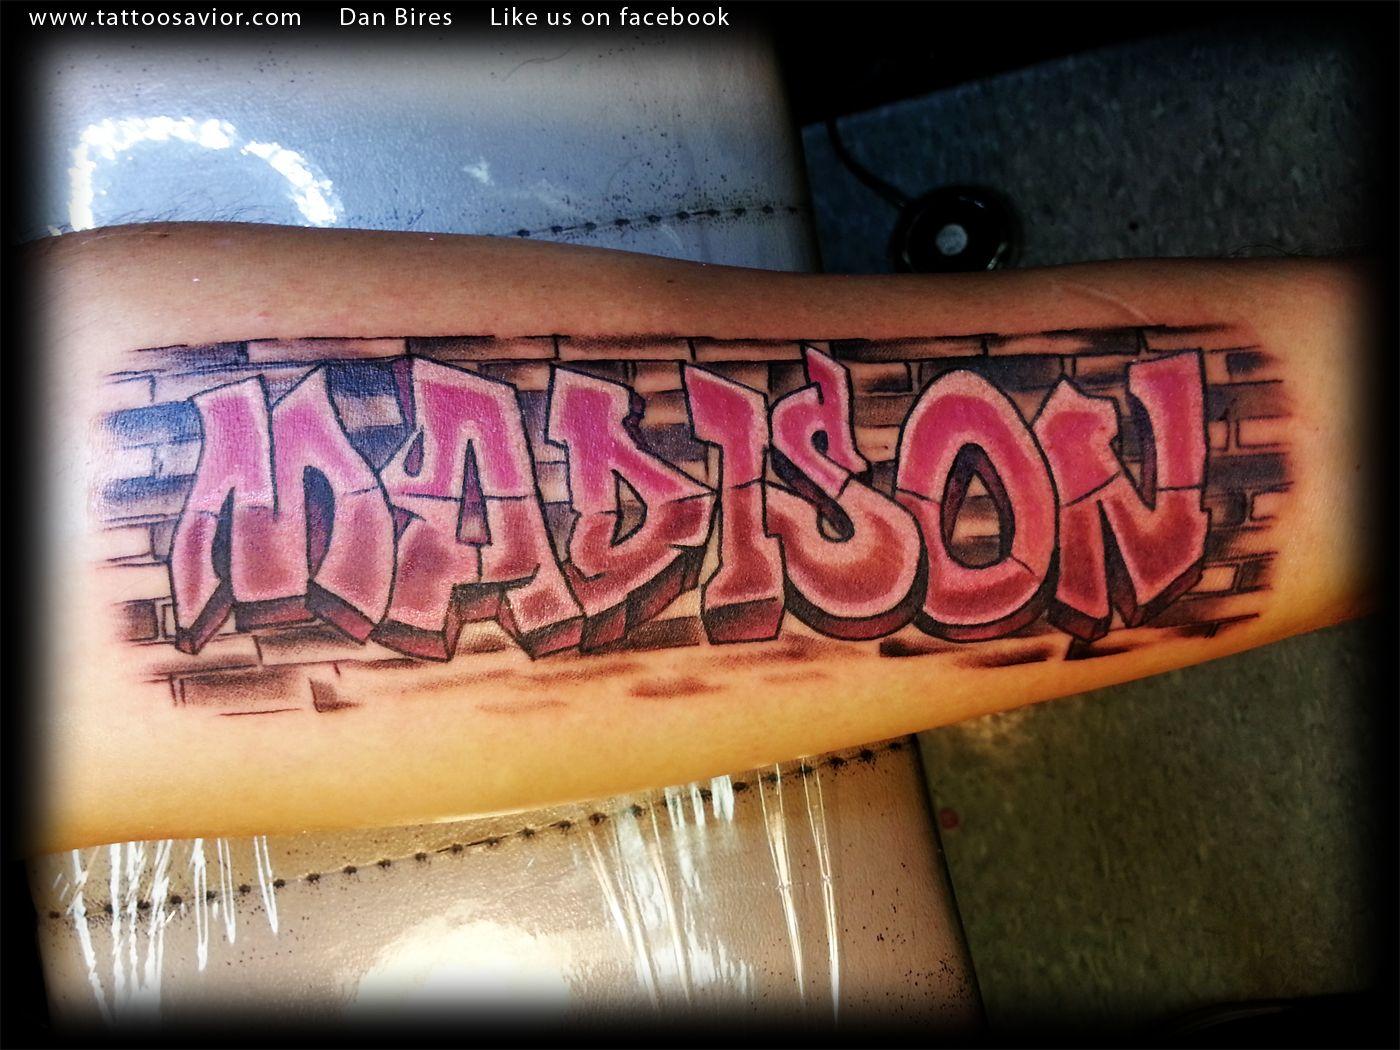 Graffiti Name And Brick Wall Tattoo By Dan Bires Jpg 1400 1050 Graffiti Names Graffiti Tattoo Wall Tattoo